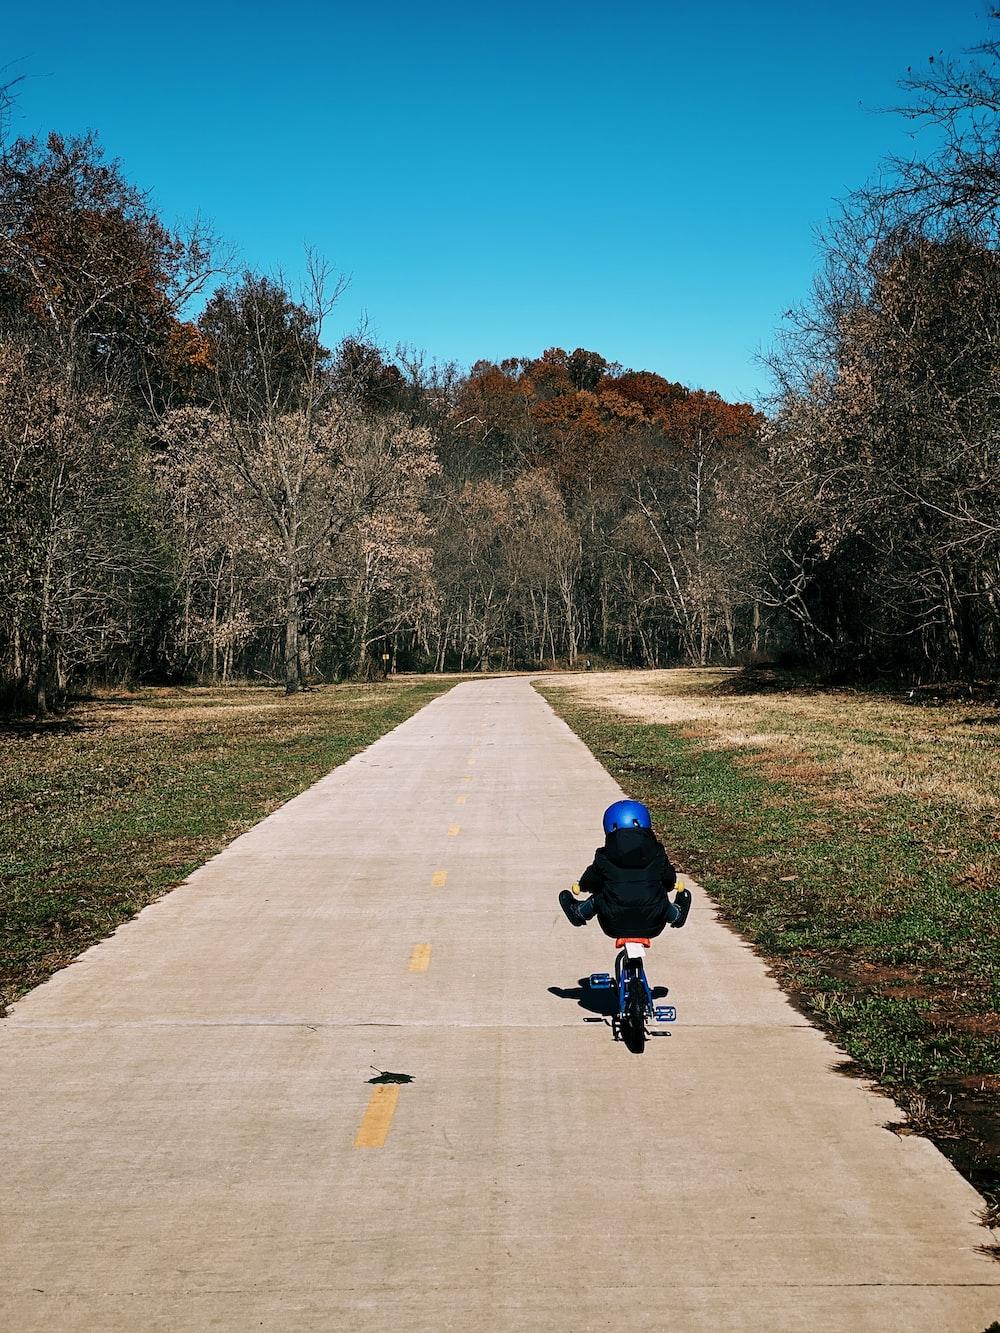 child biking on road near green field during daytime